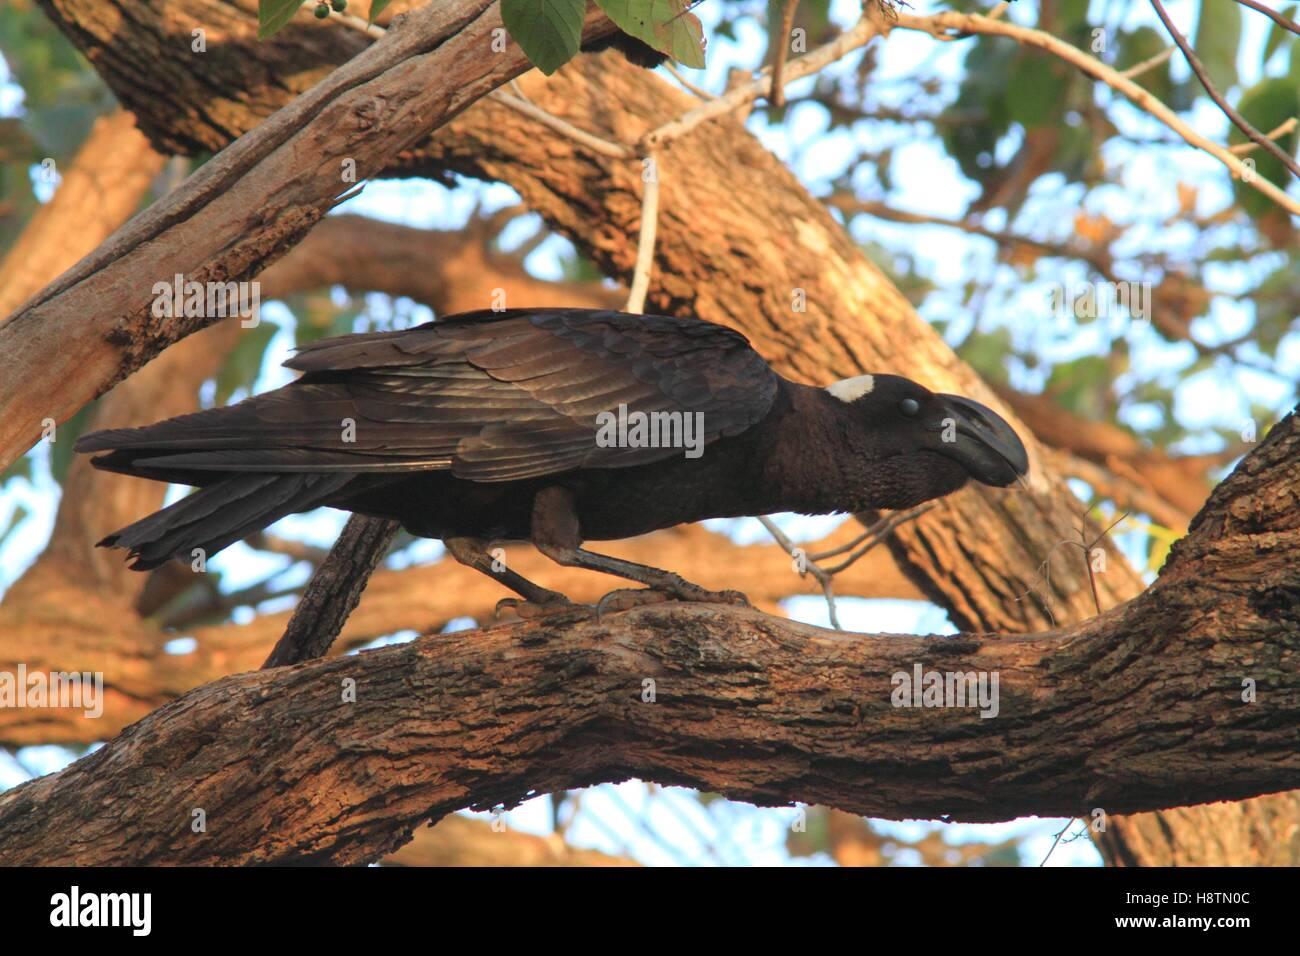 Thick-billed Raven (Corvus crassirostris) on a branch. Ethiopia - Stock Image